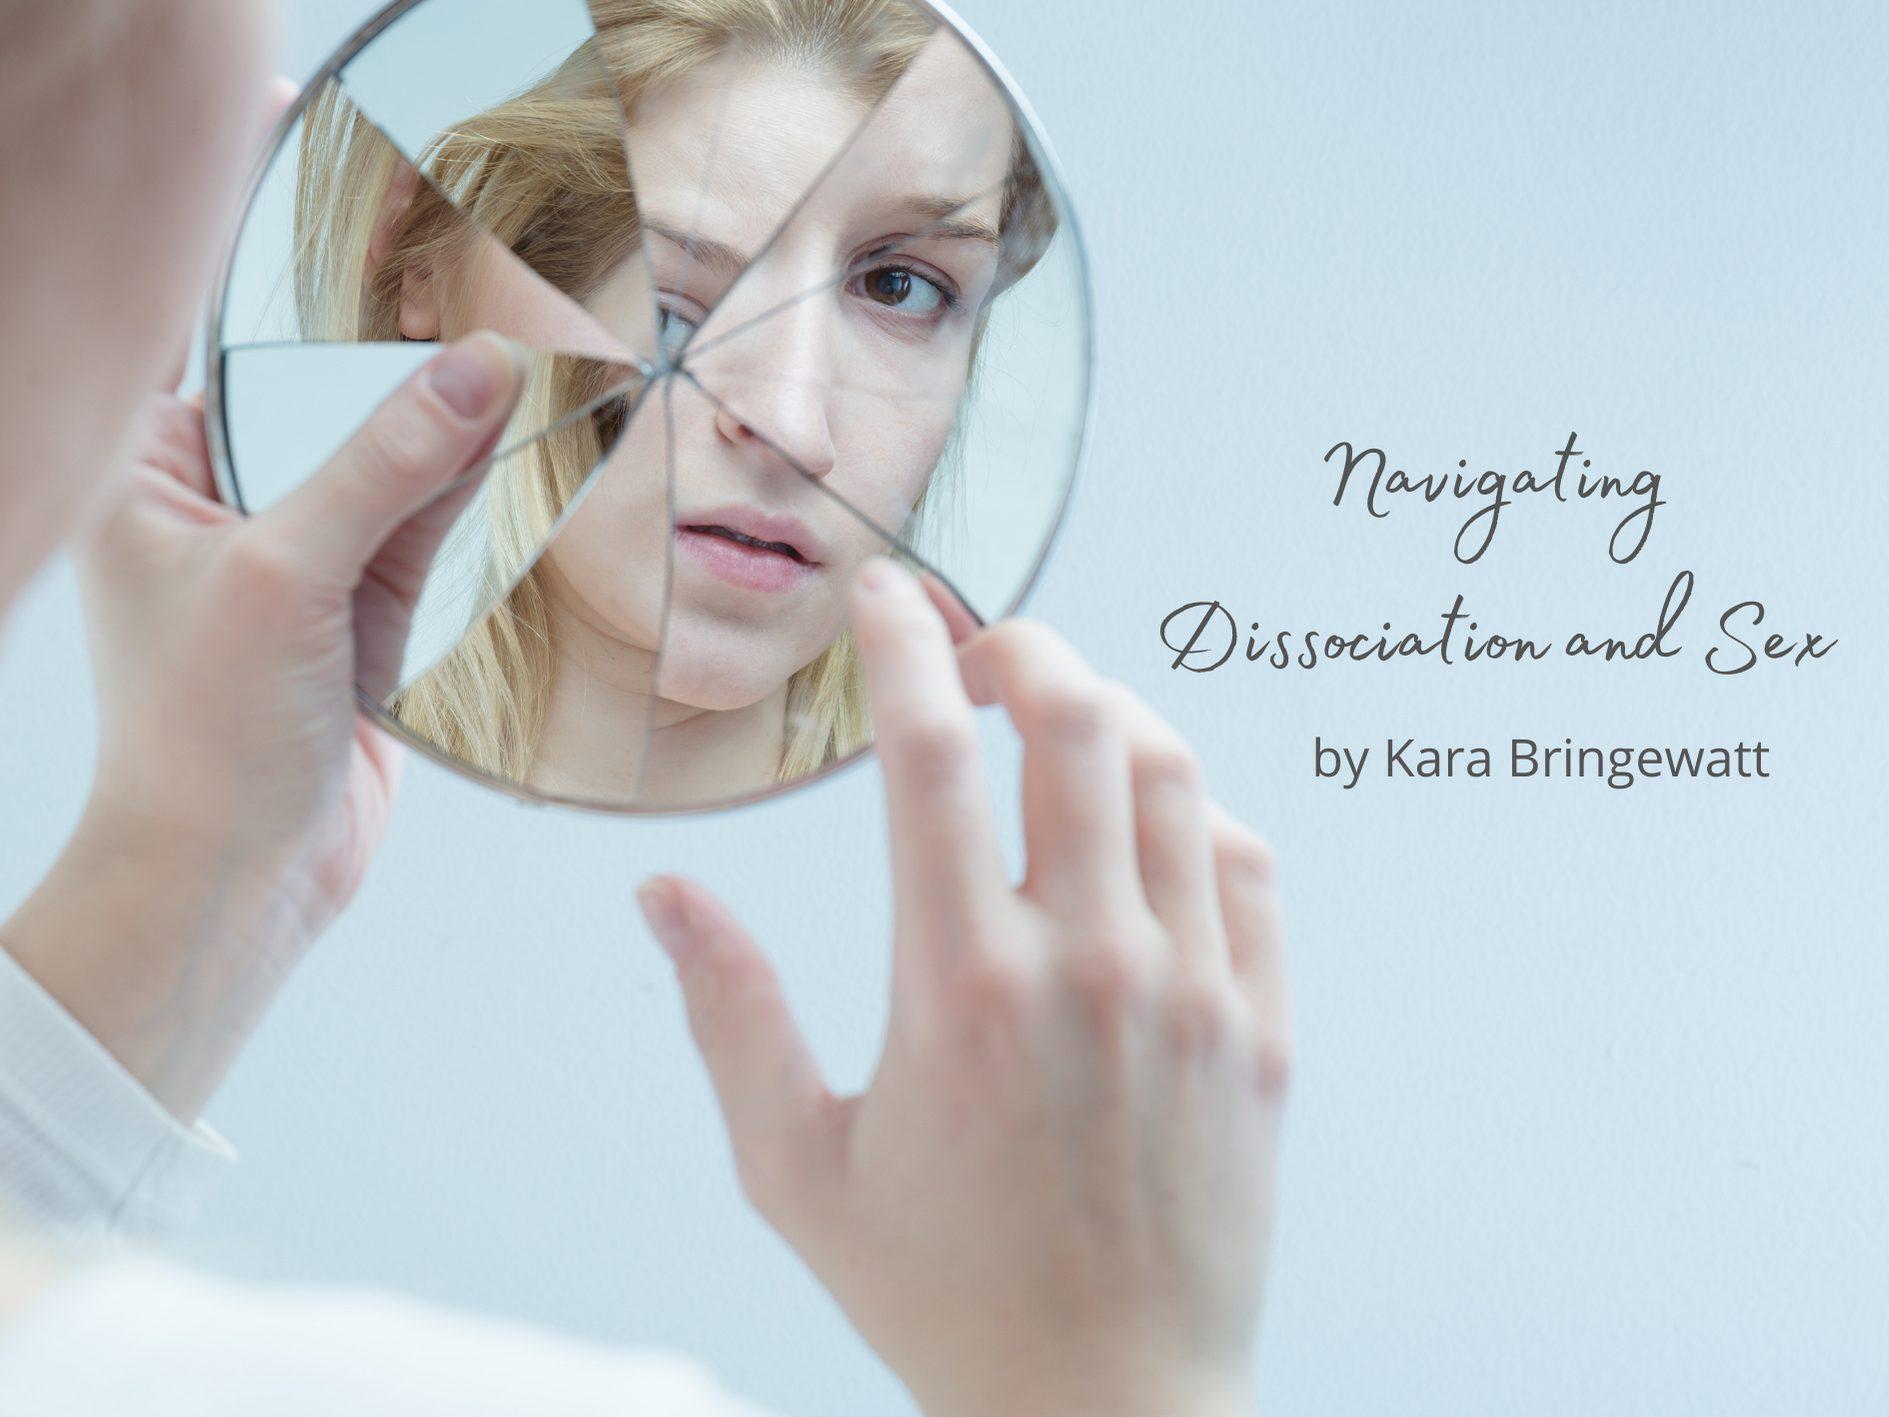 [Guest Post] Navigating Dissociation and Sex by Kara Bringewatt